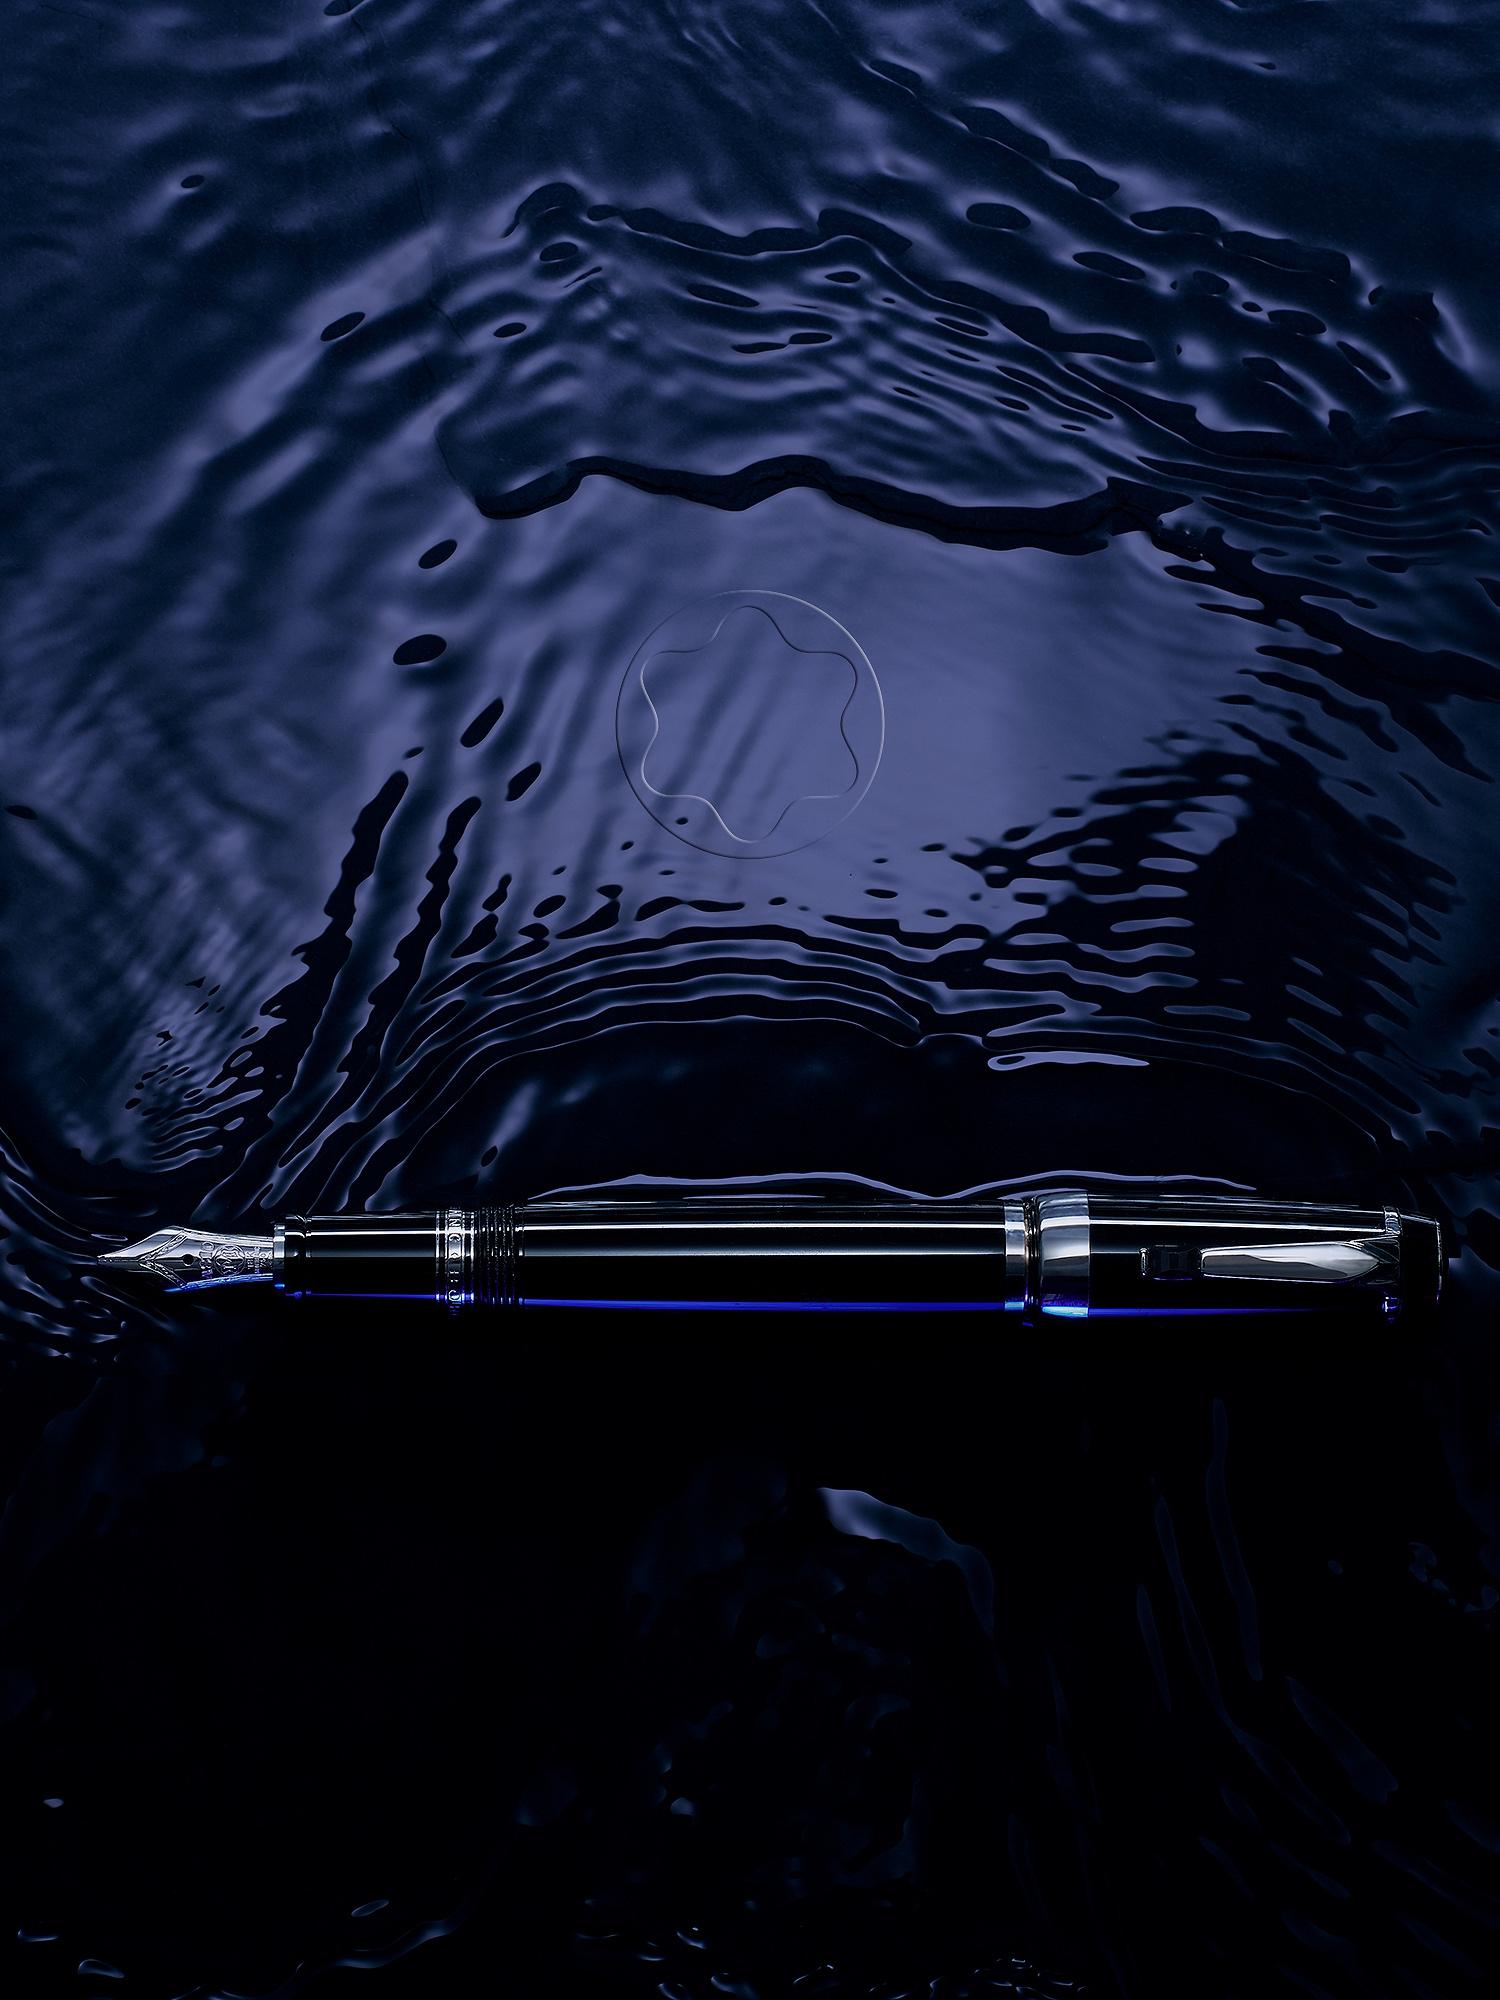 Stylo-Mont-Blanc-water.jpg